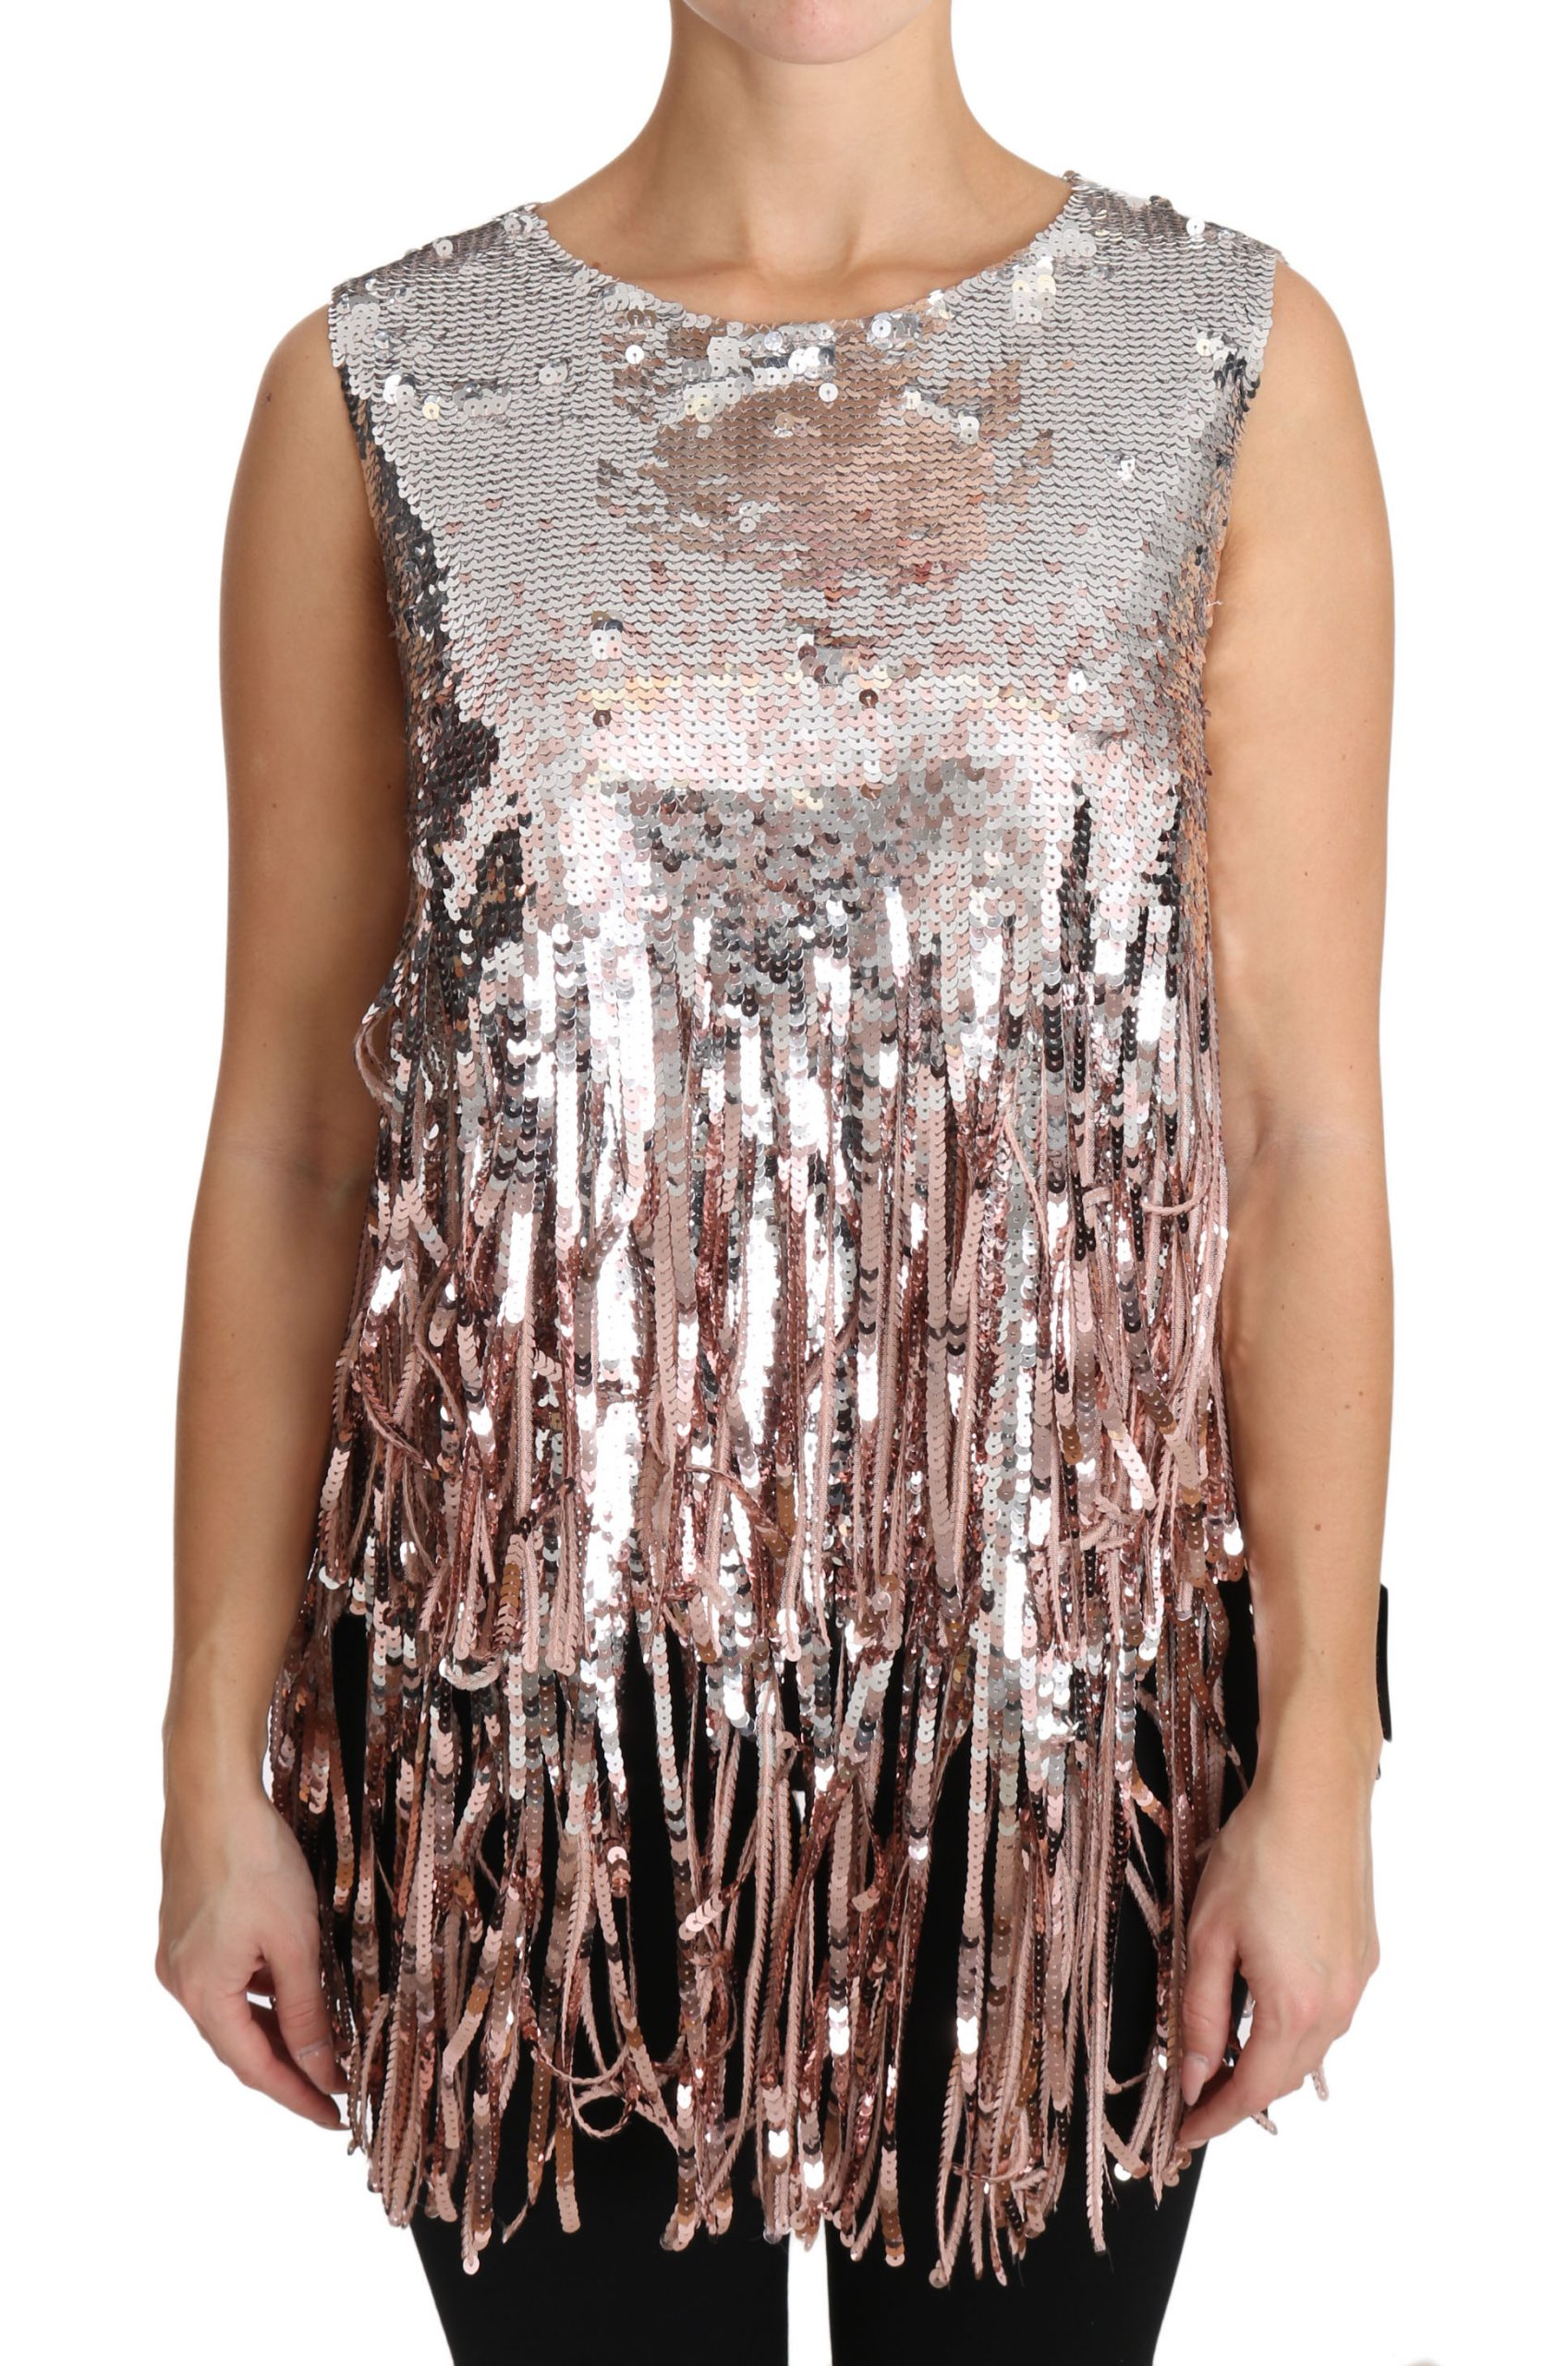 Dolce & Gabbana Women's Sequined Fringe Top Multicolor DR1574 - IT48|XXL